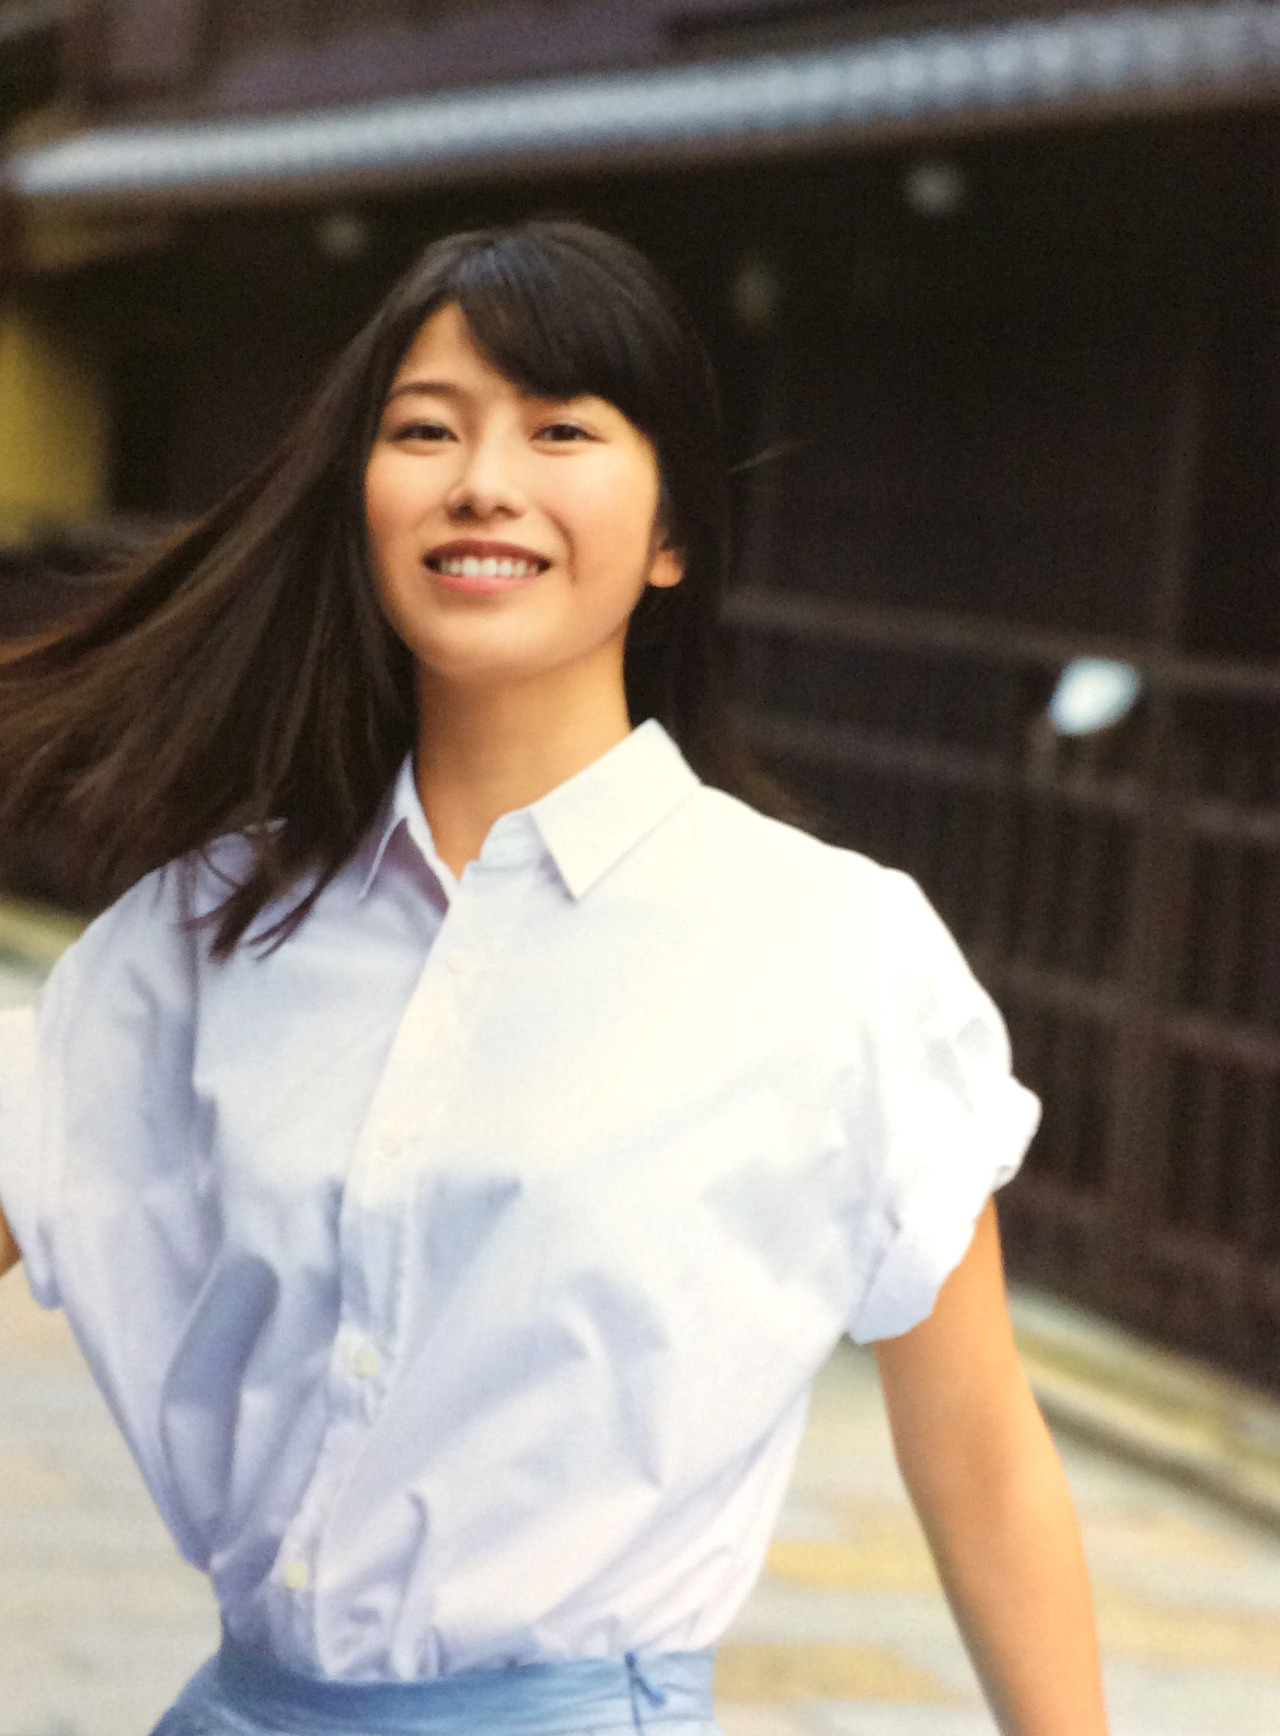 Yokoyama Yui 1st Photobook Yuihan Yokoyama Yui Photo